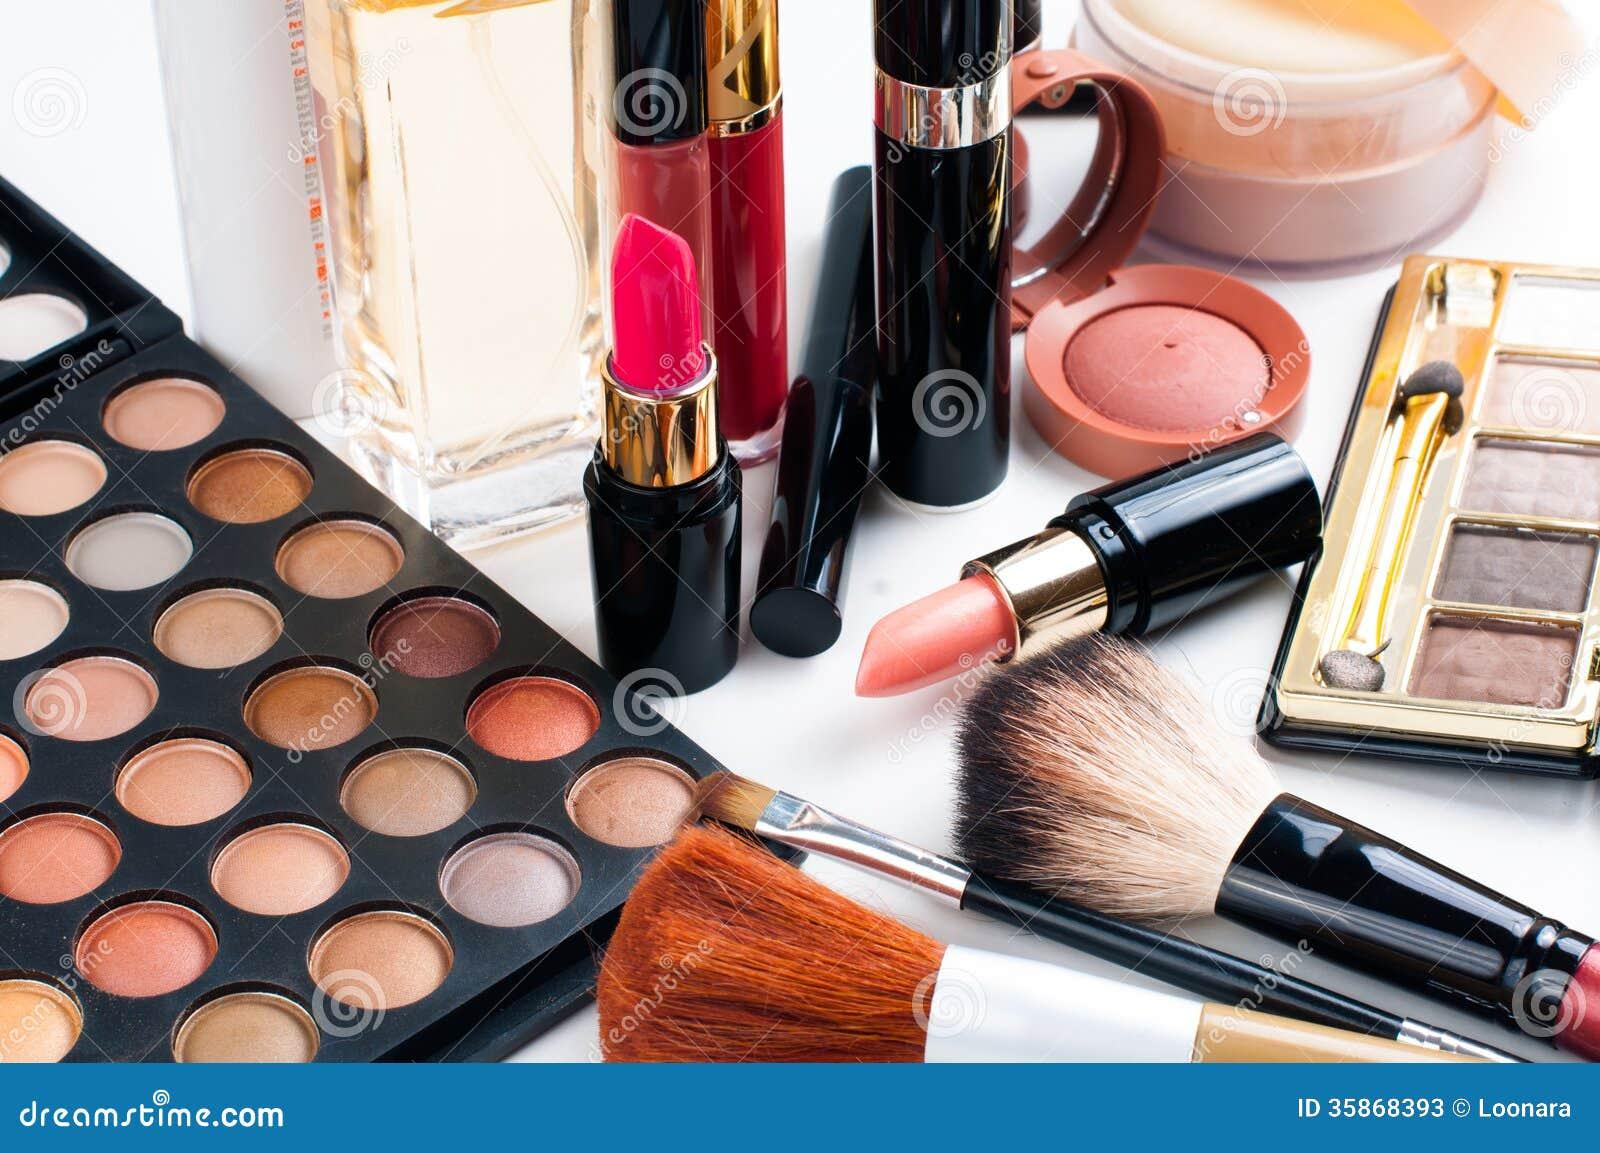 makeup cosmetics set professional eyeshadow palette lipstick mascara blush powder make up brushes perfume many closeup 35868393